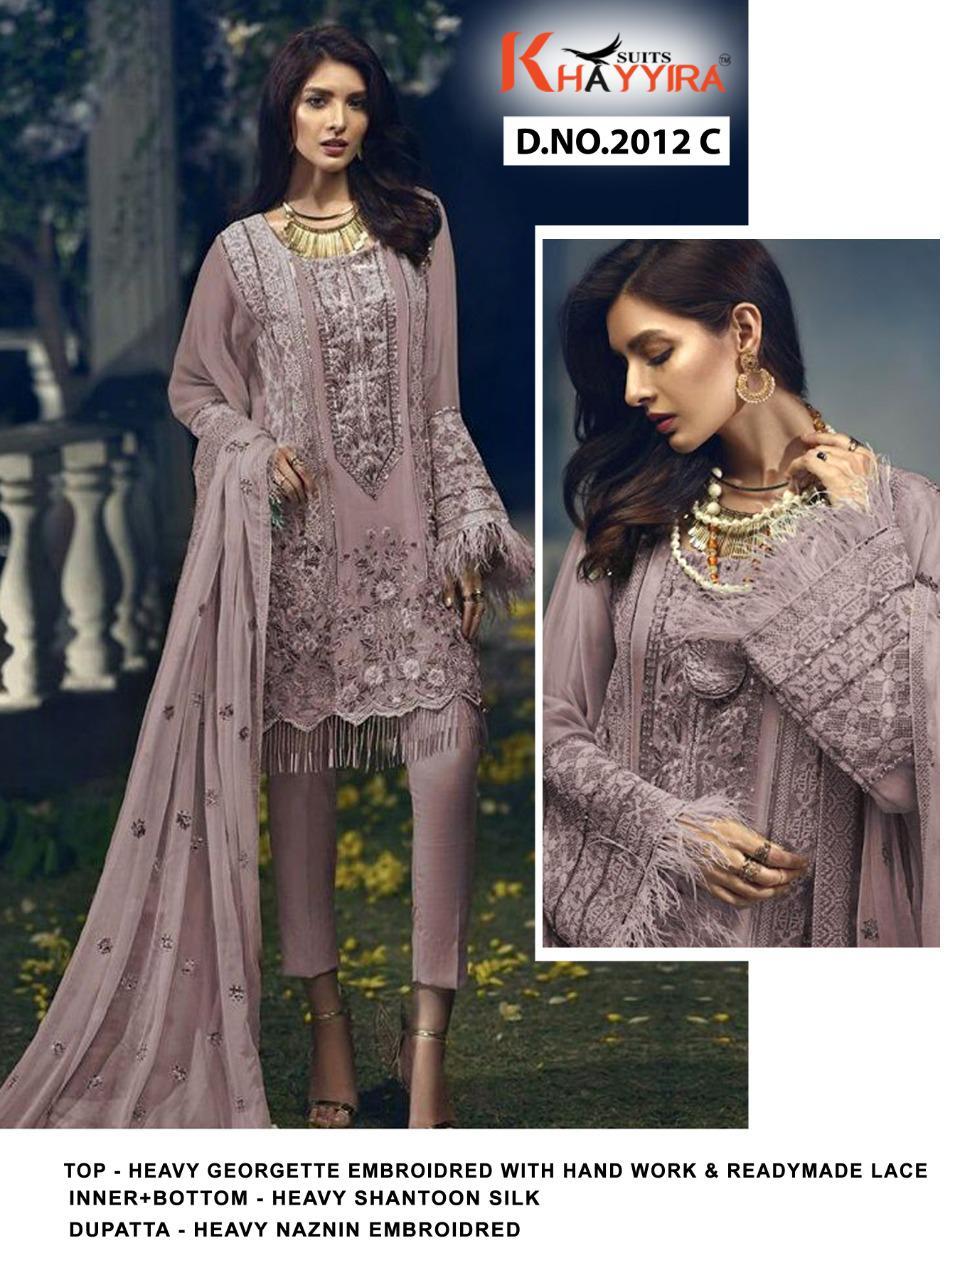 Khayyira Cross Stitch Salwar Suit Wholesale Catalog 8 Pcs 2 - Khayyira Cross Stitch Salwar Suit Wholesale Catalog 8 Pcs